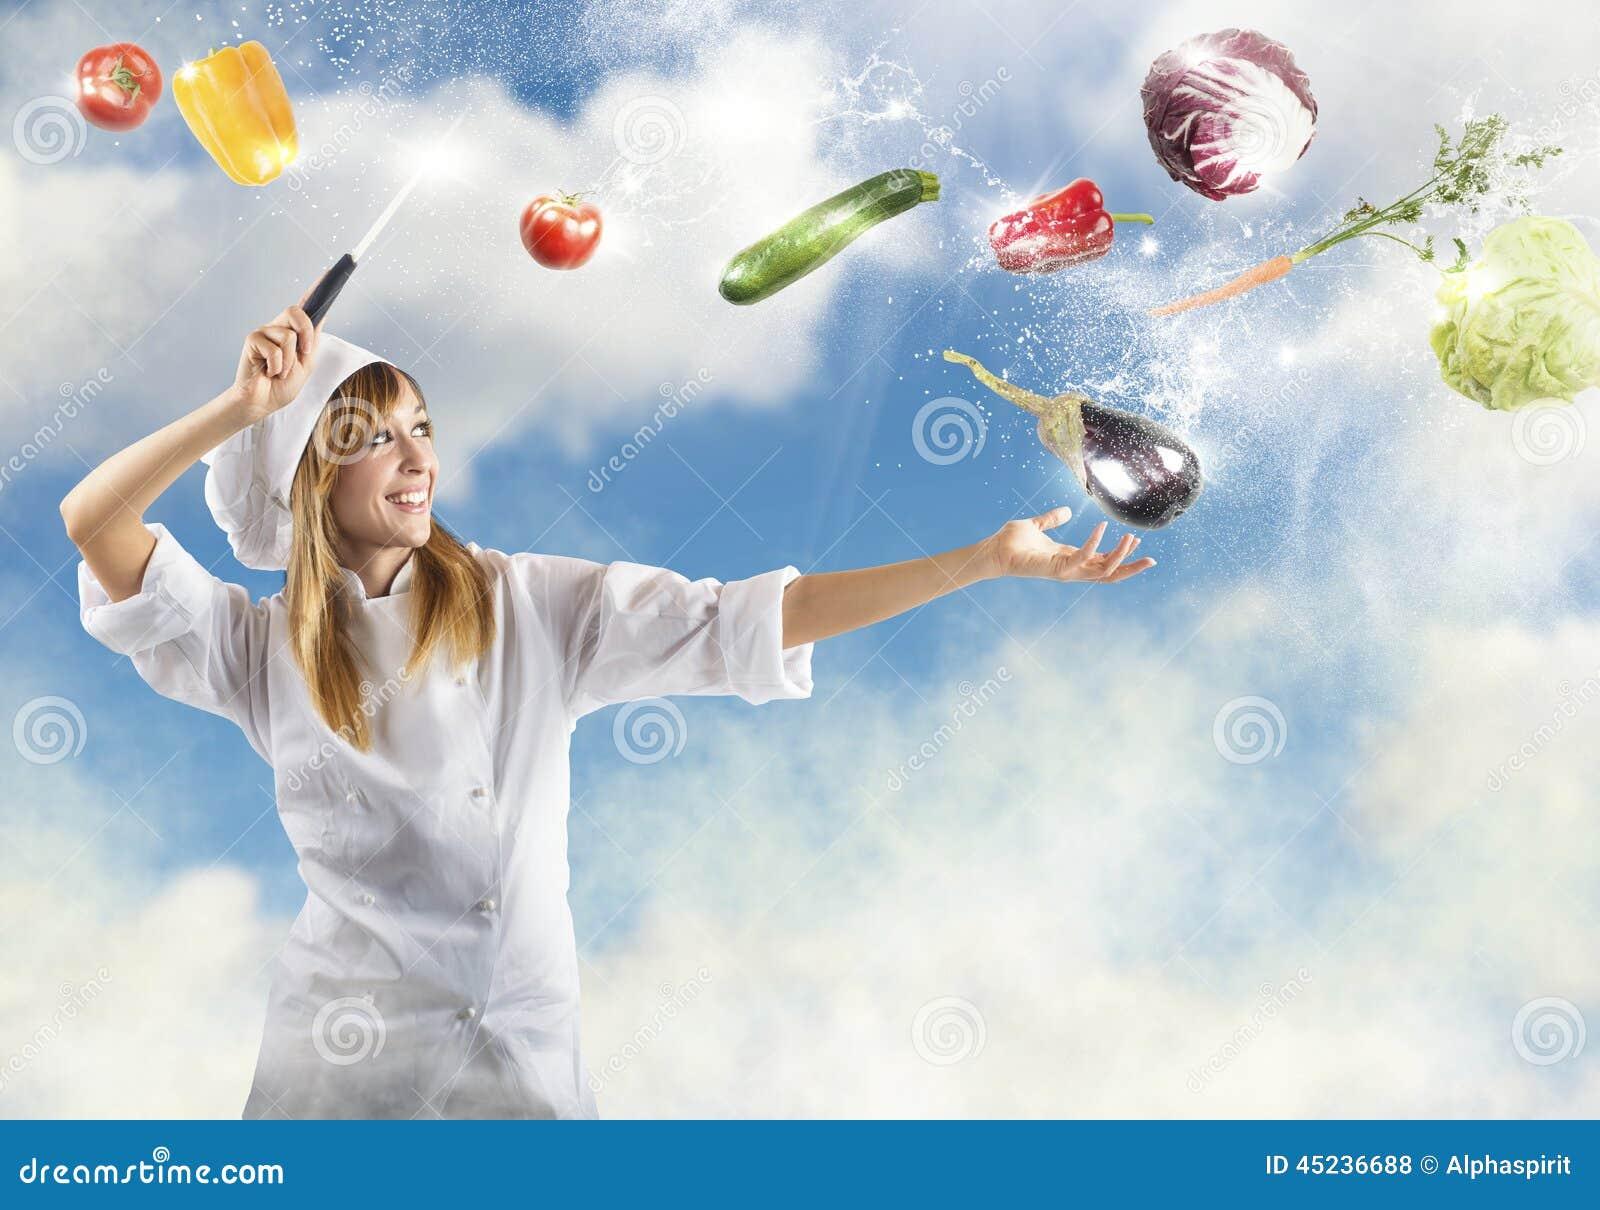 cuisine magique photo stock - image: 45236688